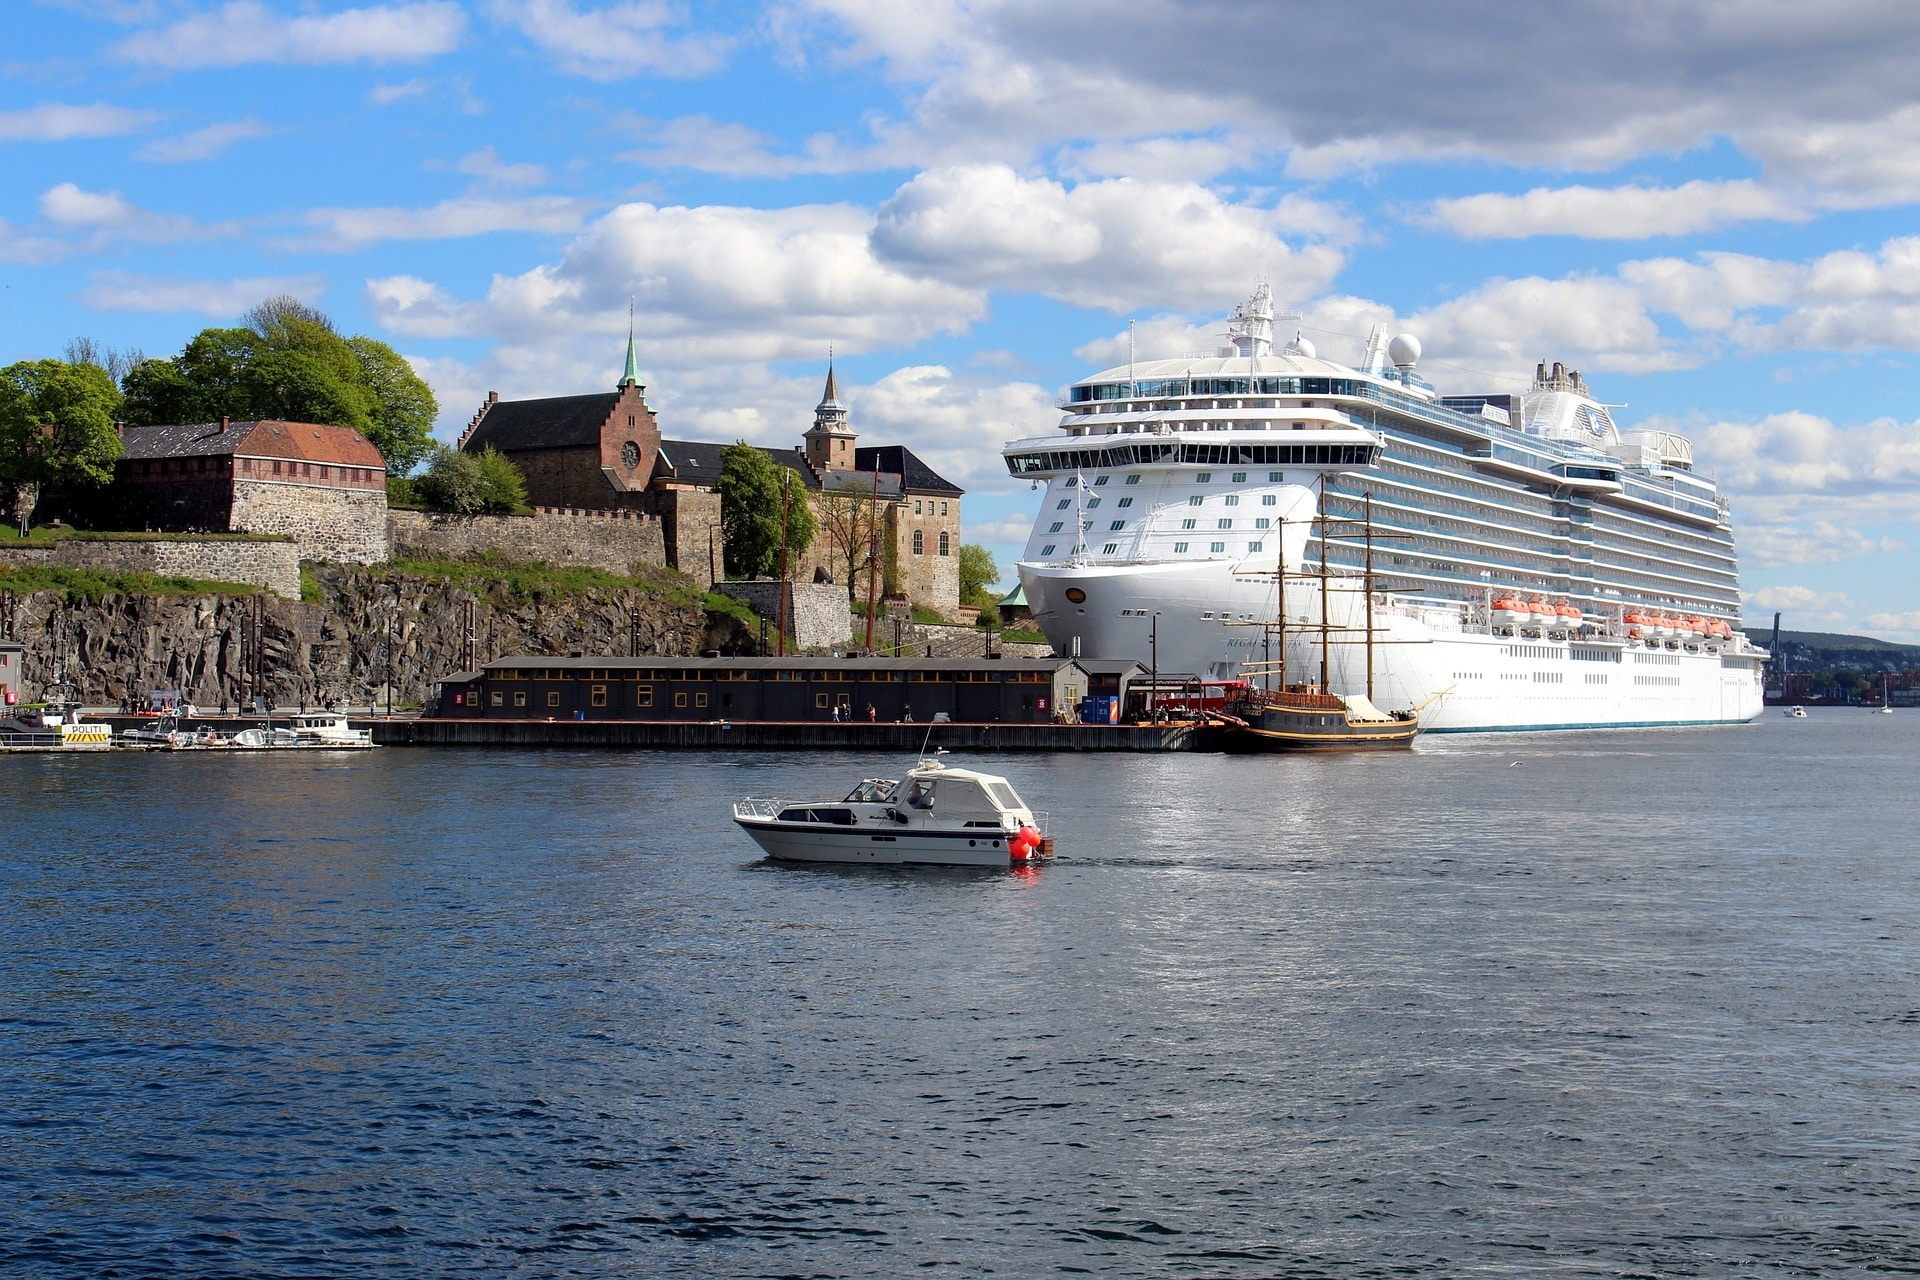 Minikreuzfahrt nach Oslo: Ausflugsziele, Tipps & Sehenswürdigkeiten